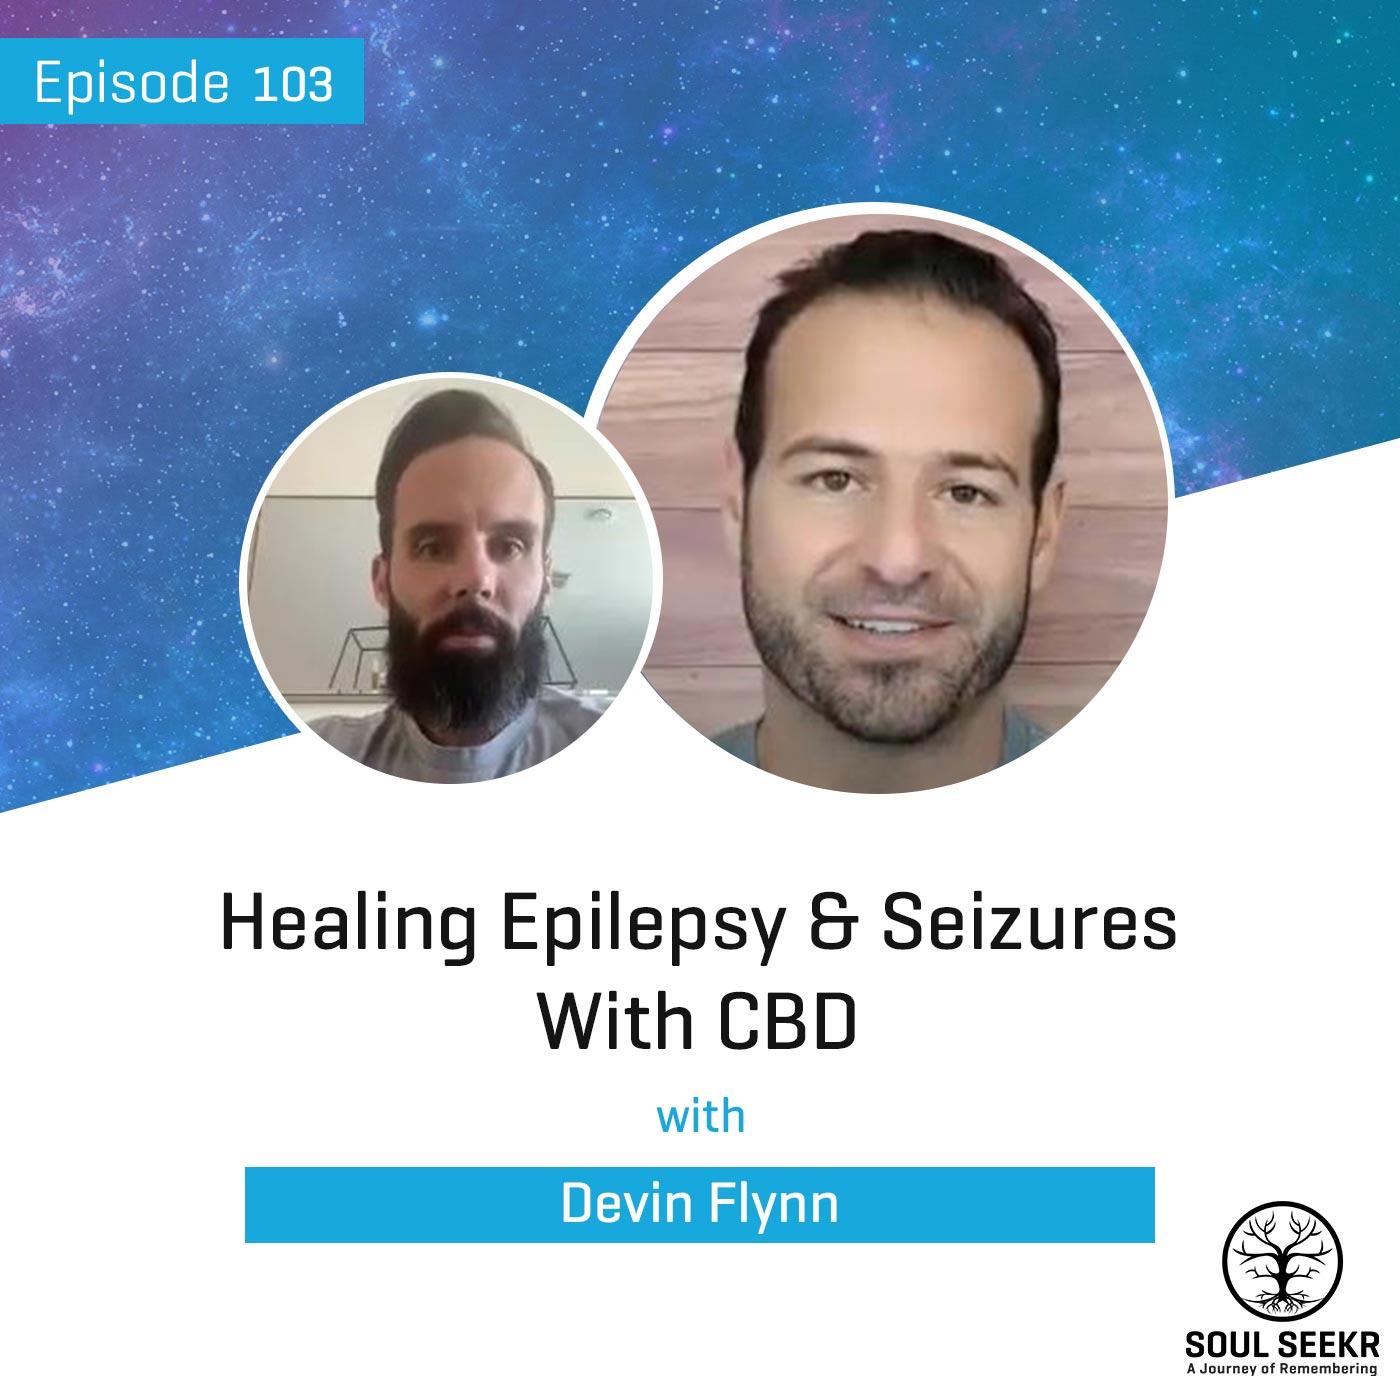 #103: Healing Epilepsy & Seizures w/ CBD